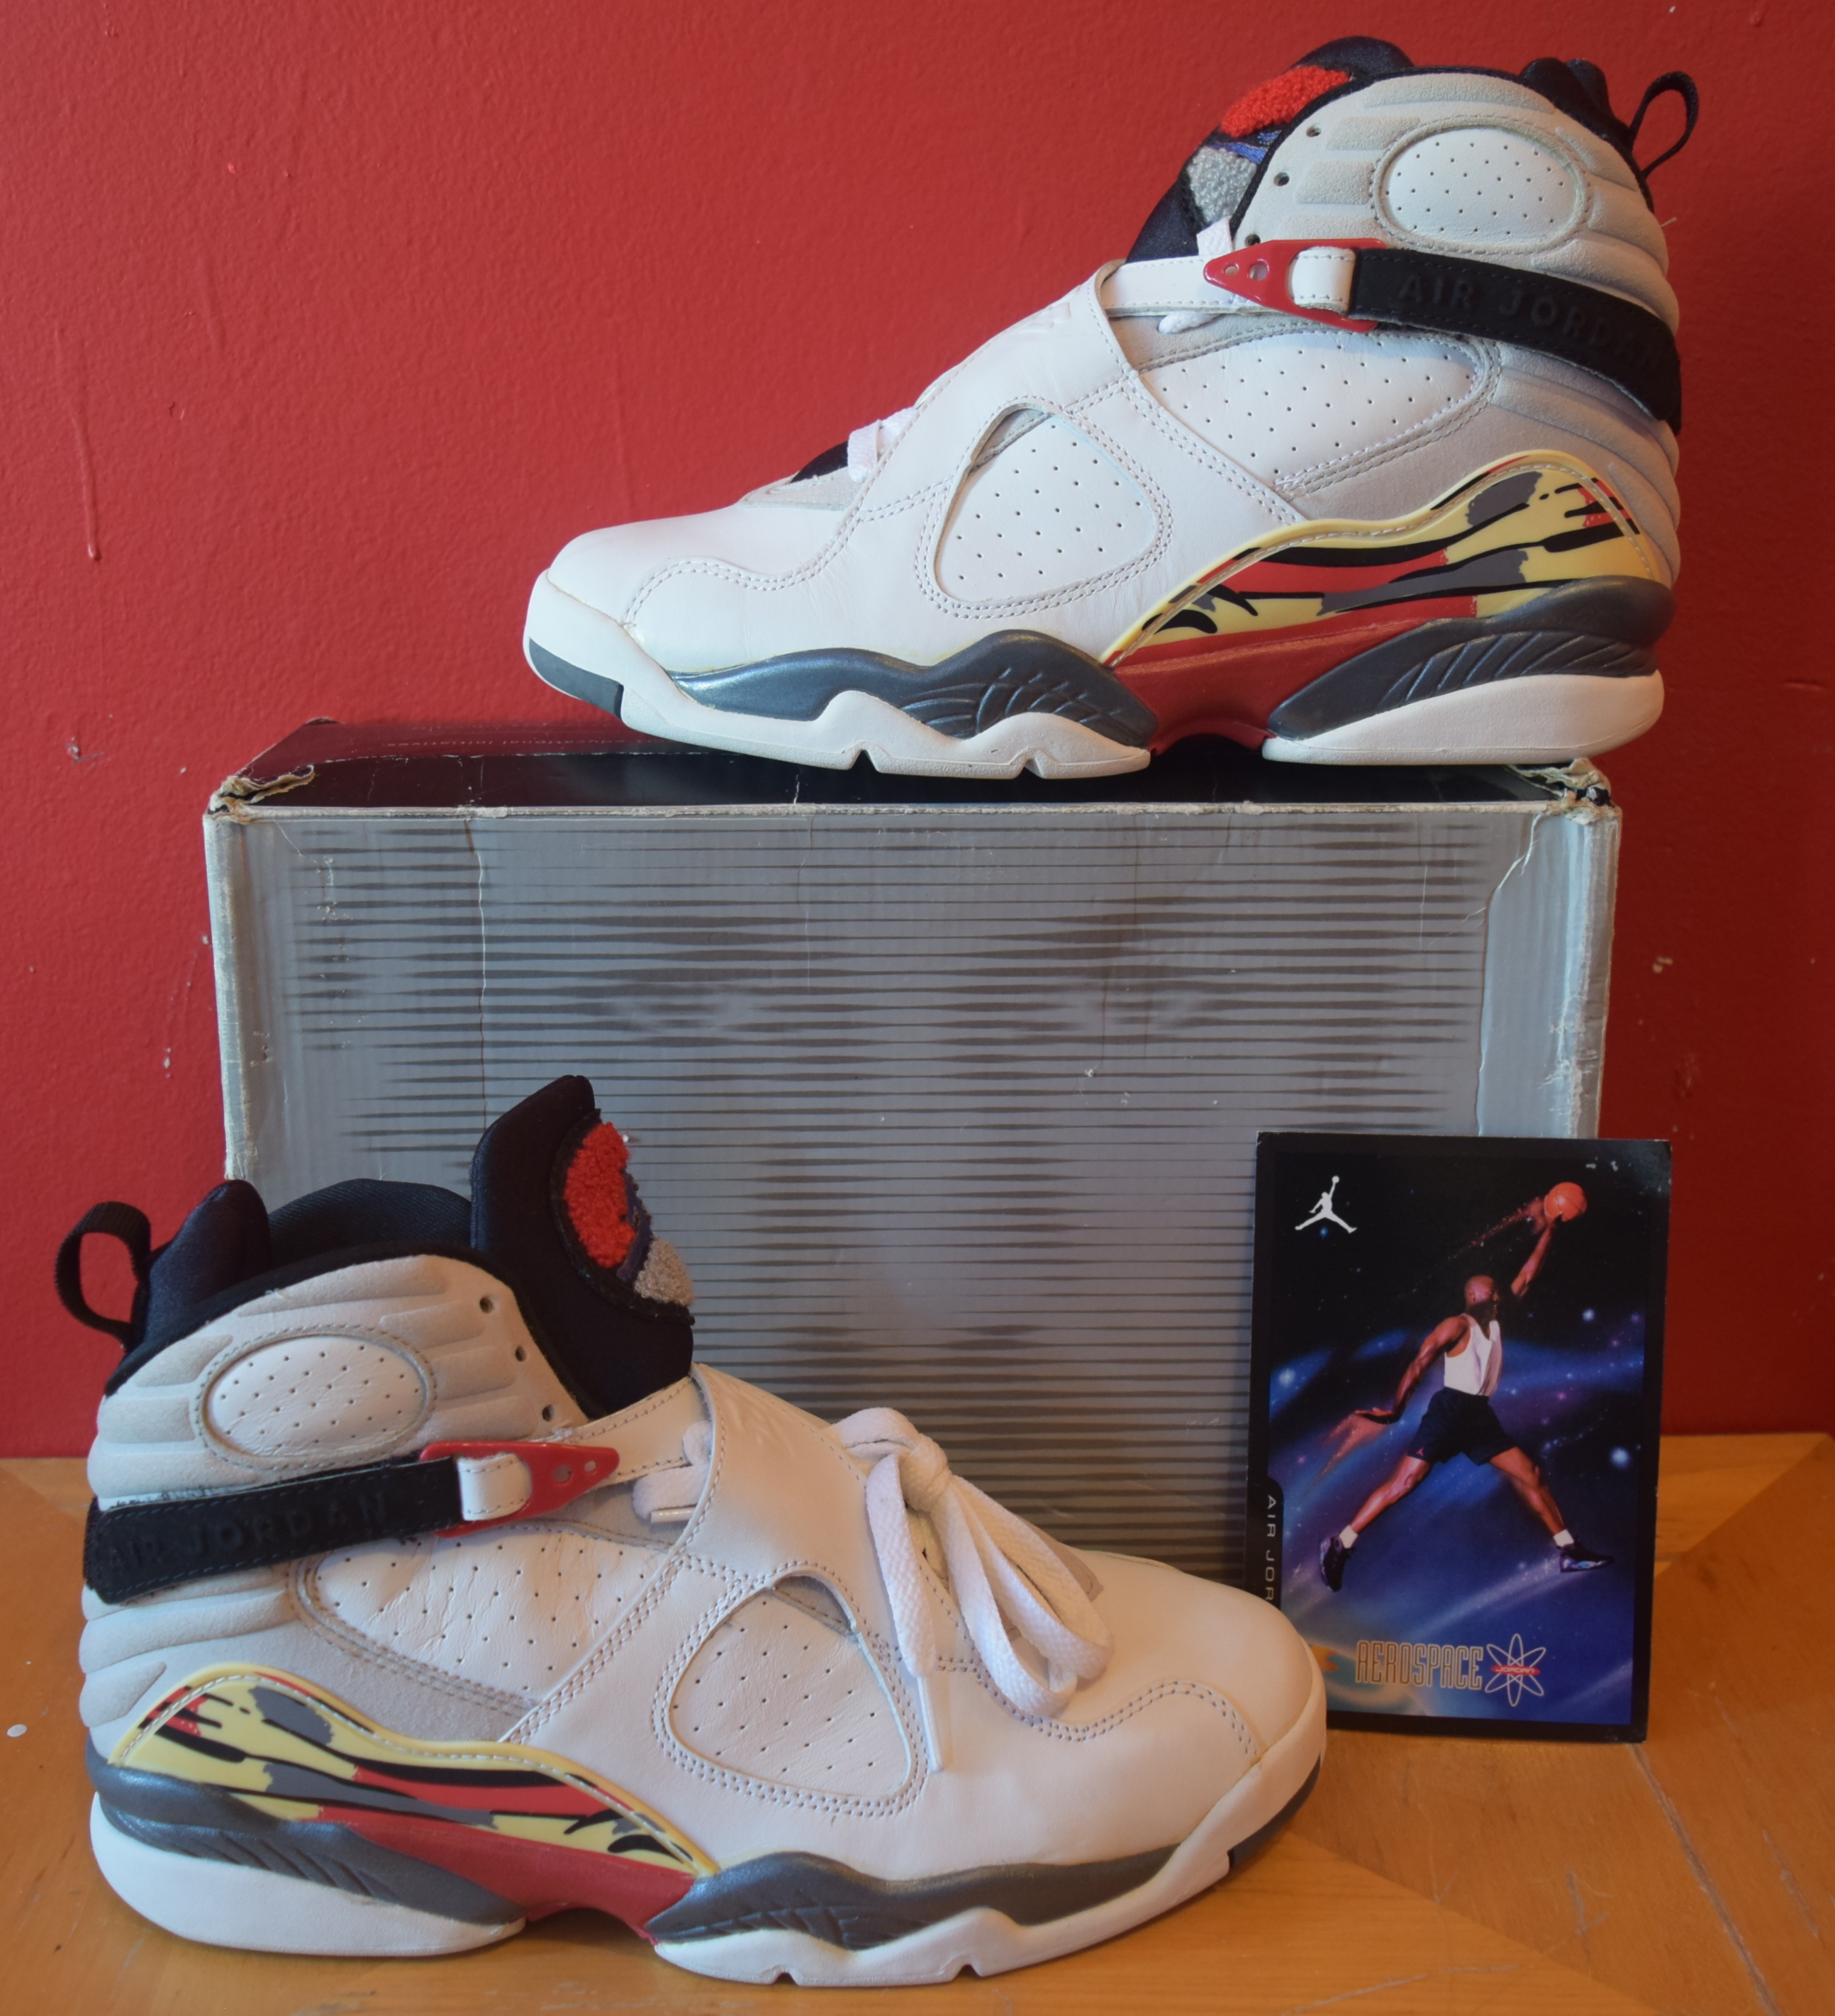 pretty nice 57b14 f2bb0 Jordan Brand. Details about Air Jordan VIII 8 Retro 2003 NEW Size 9 White True  Red Black DEADSTOCK